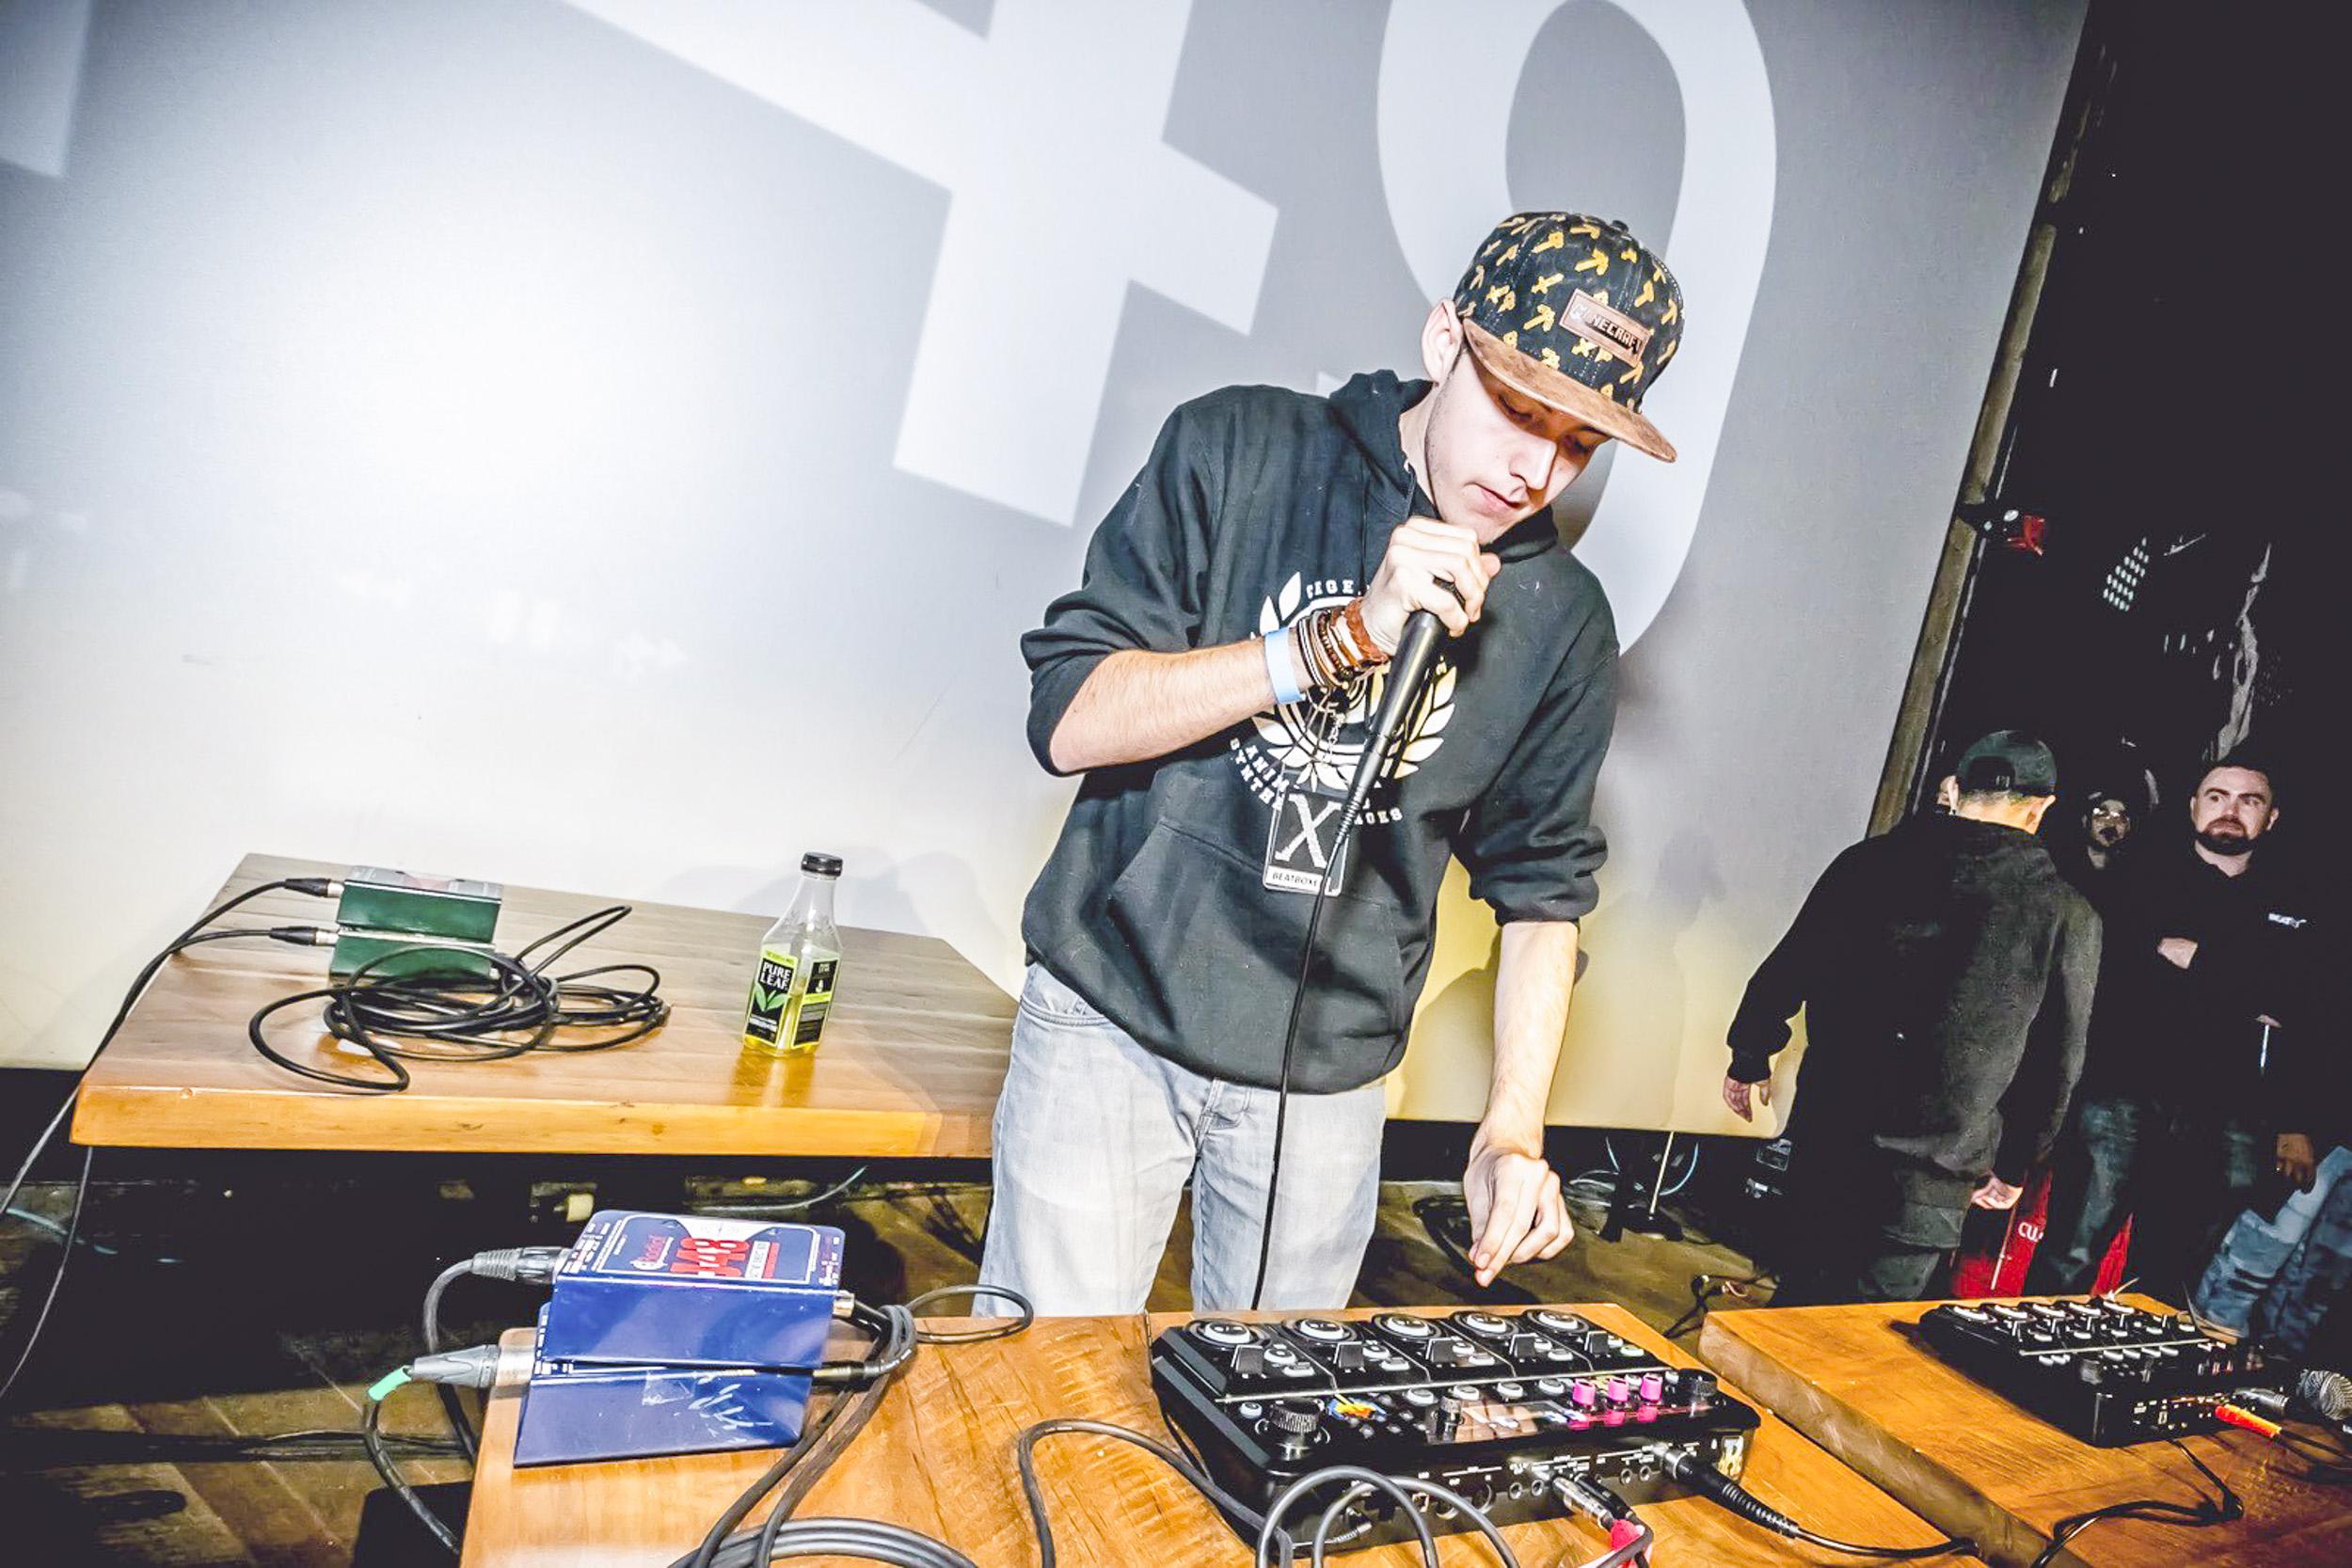 Beatbox loop station Matane